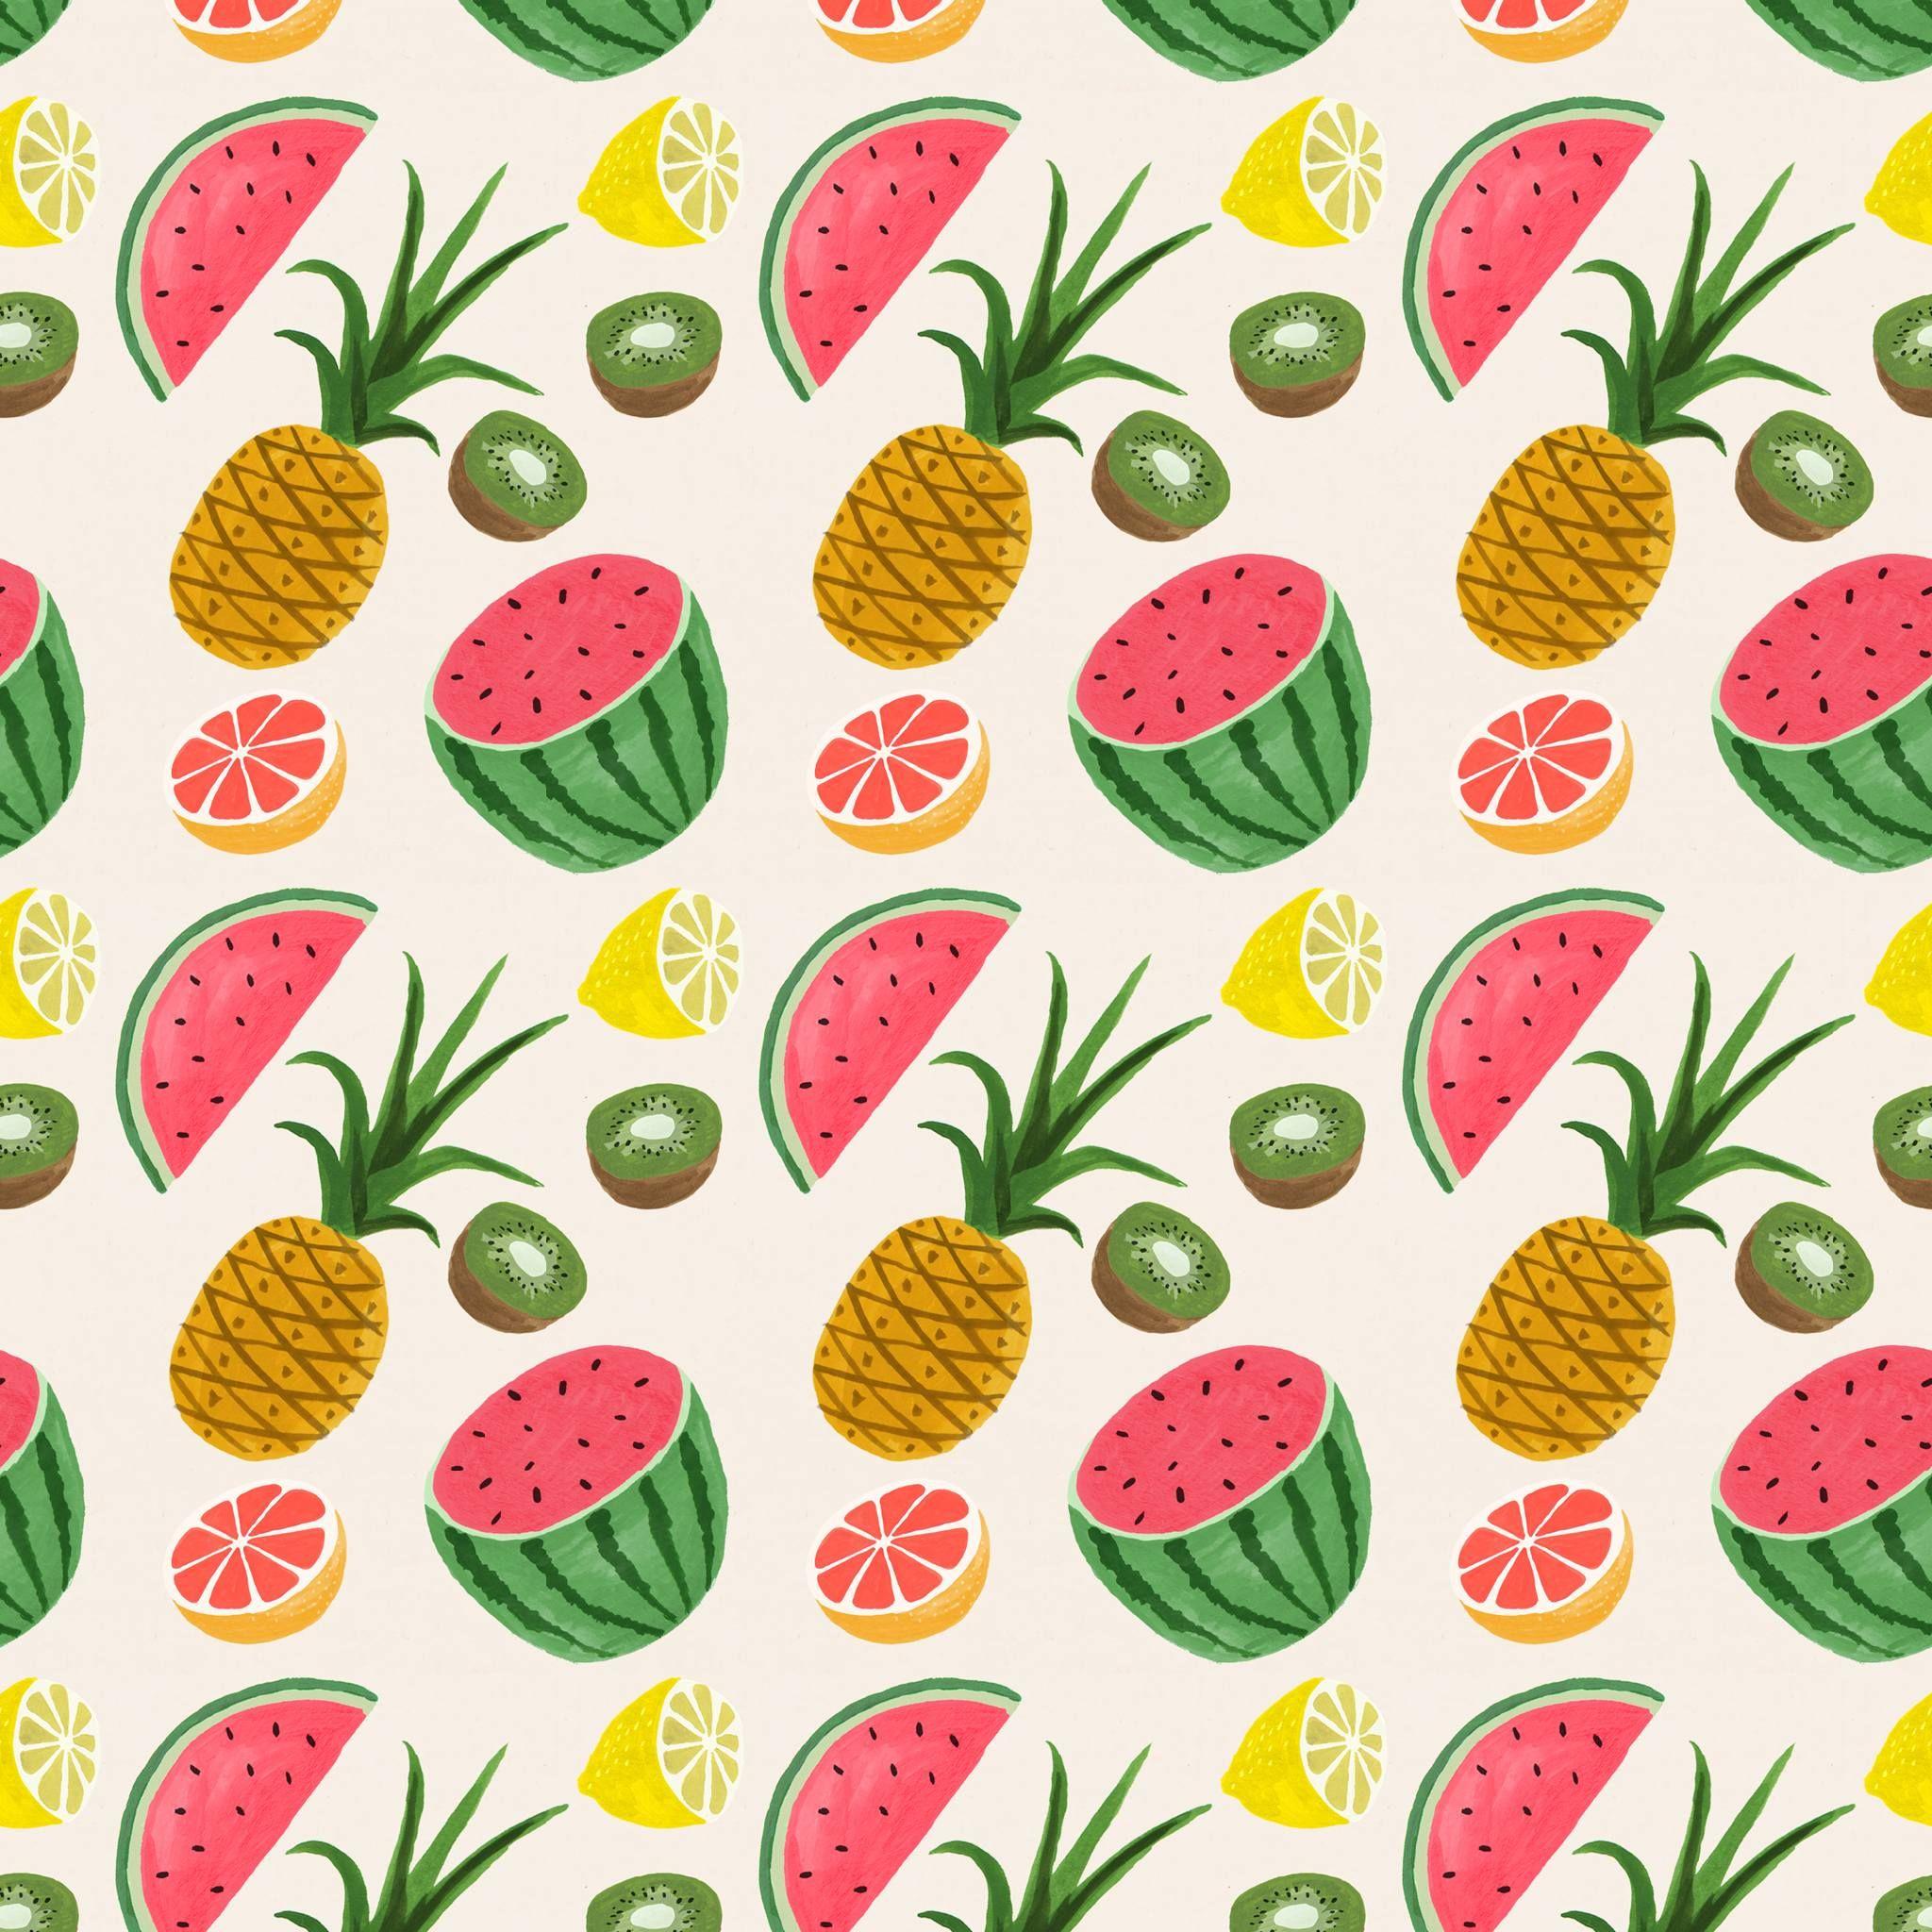 Top Wallpaper Home Screen Pineapple - e7ac2f5d3282690f6c891eae06af5f88  Photograph_346493.jpg